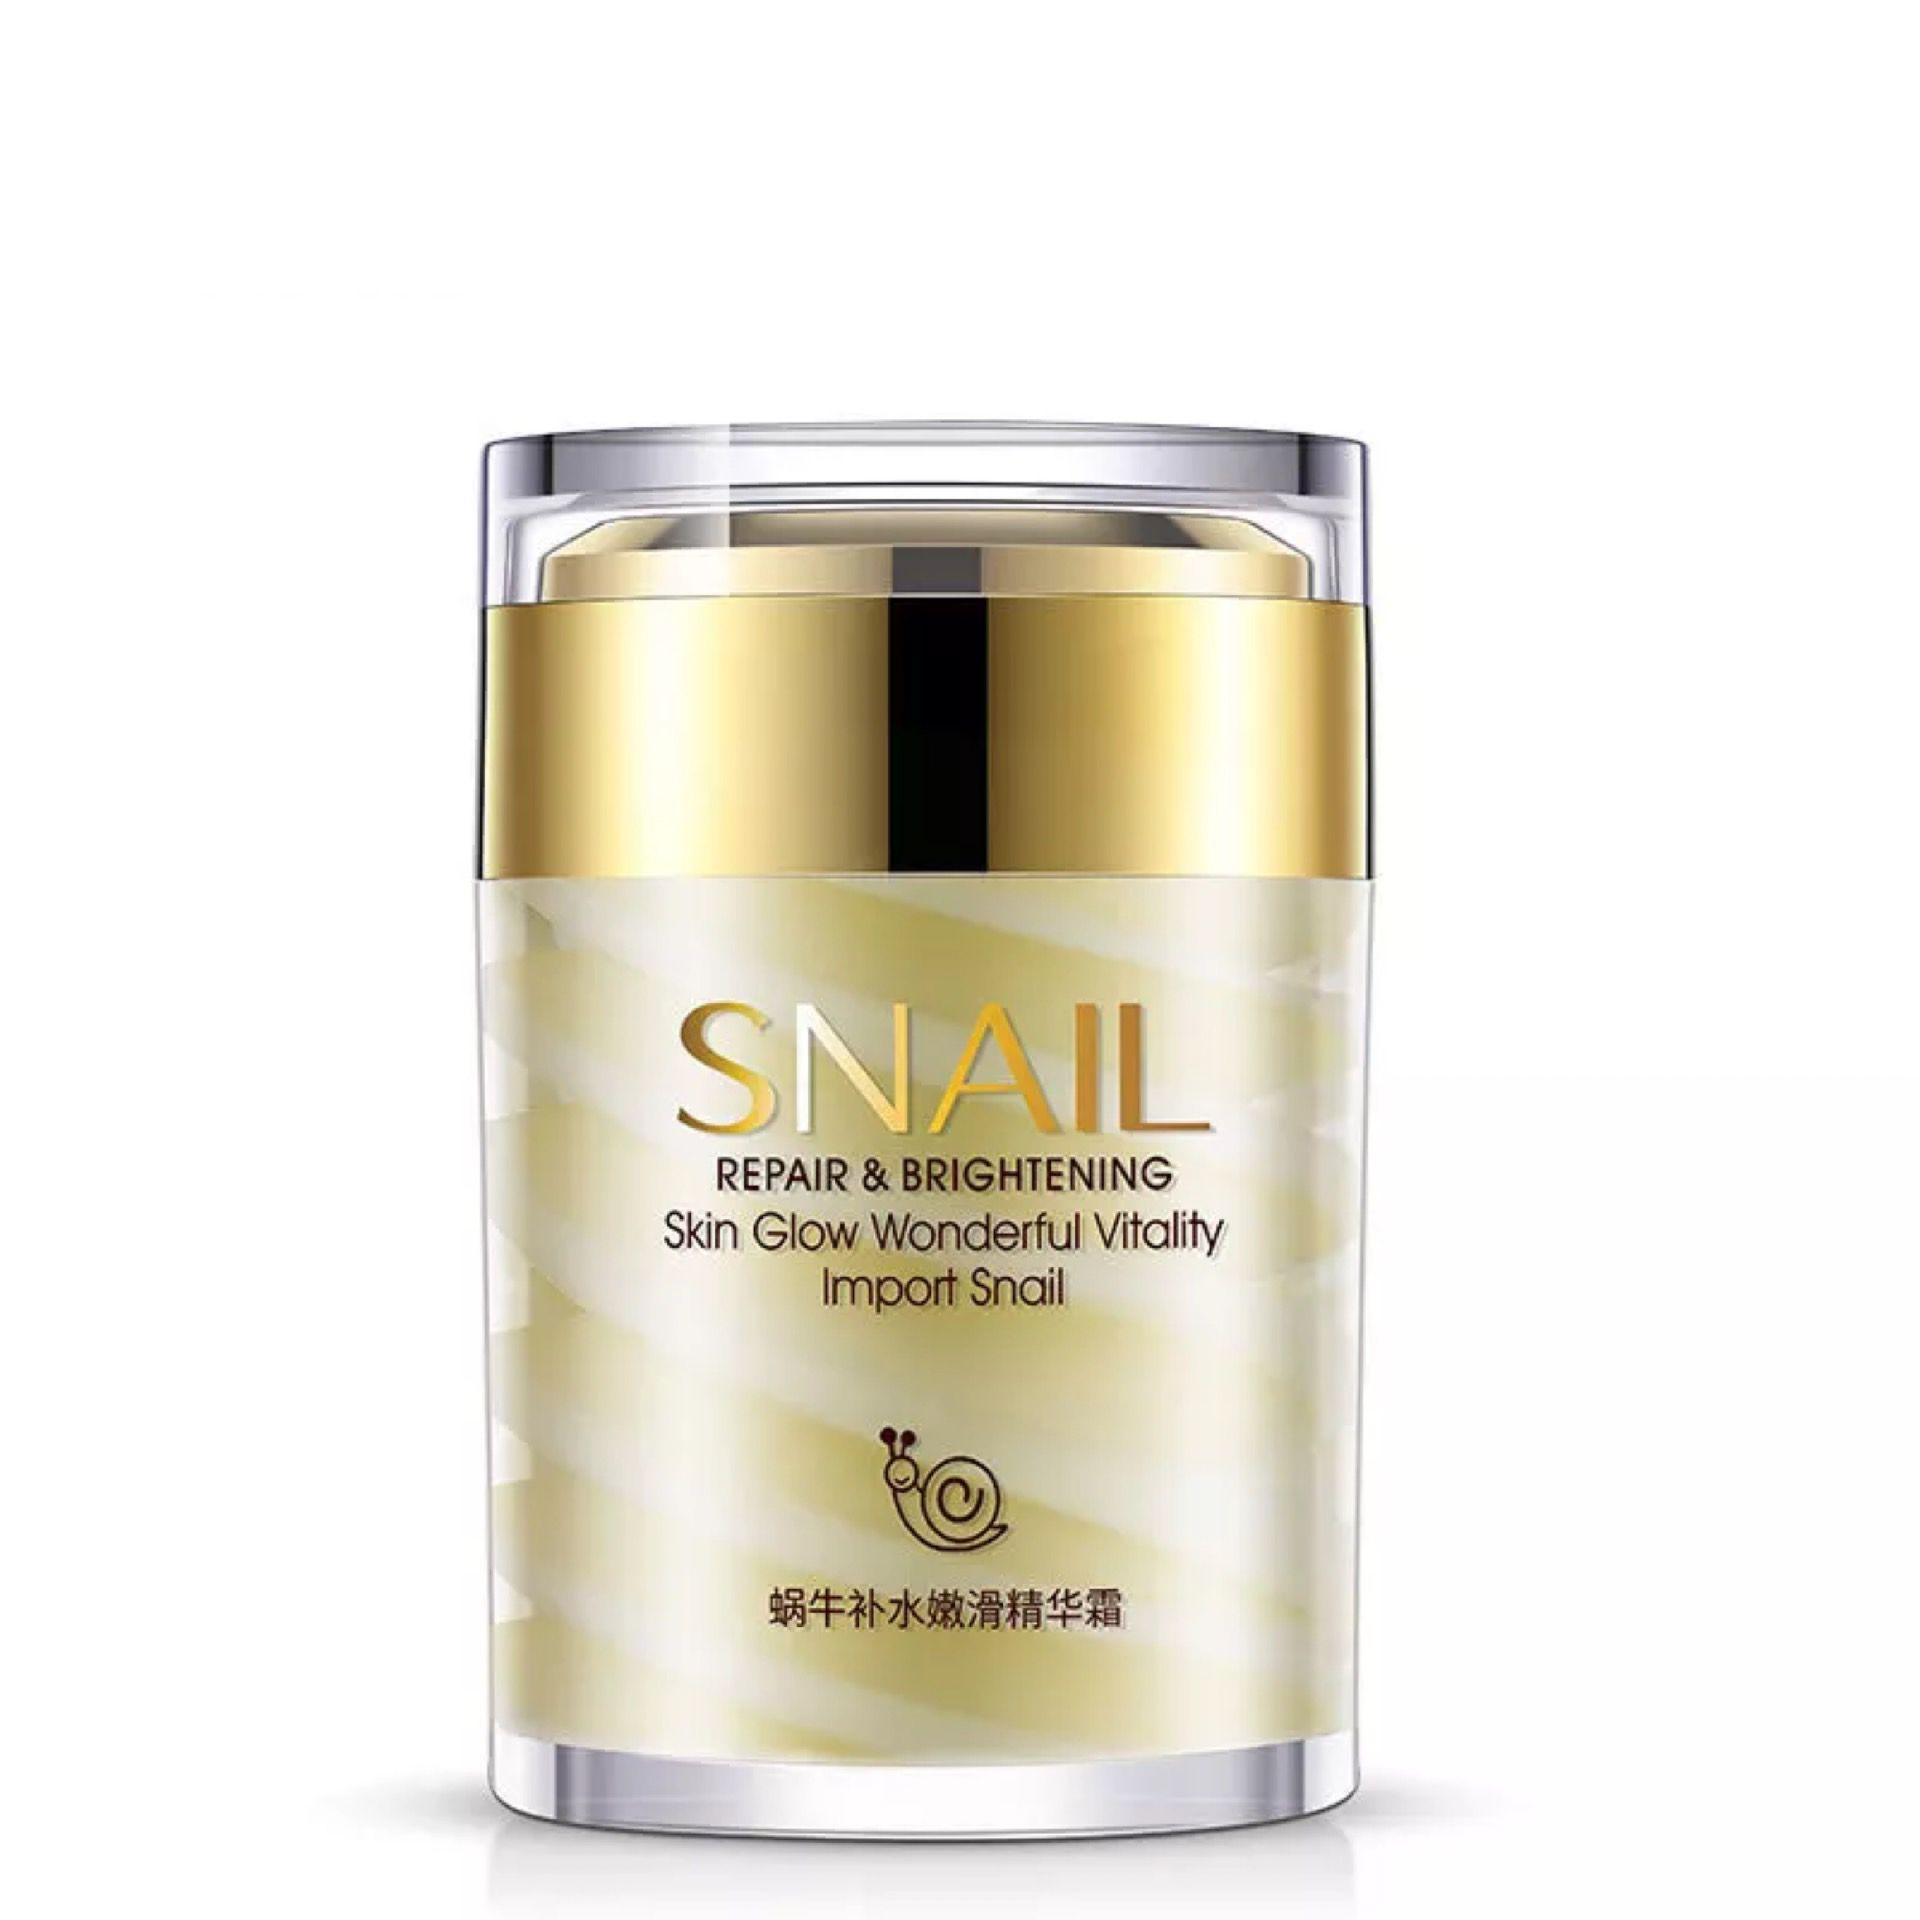 Beauty & Health Essential Oil 24k Gold Crystal Clear Moisturizing Essence Liquid Water Nourishing Moisturizer Essence Skin Care Products